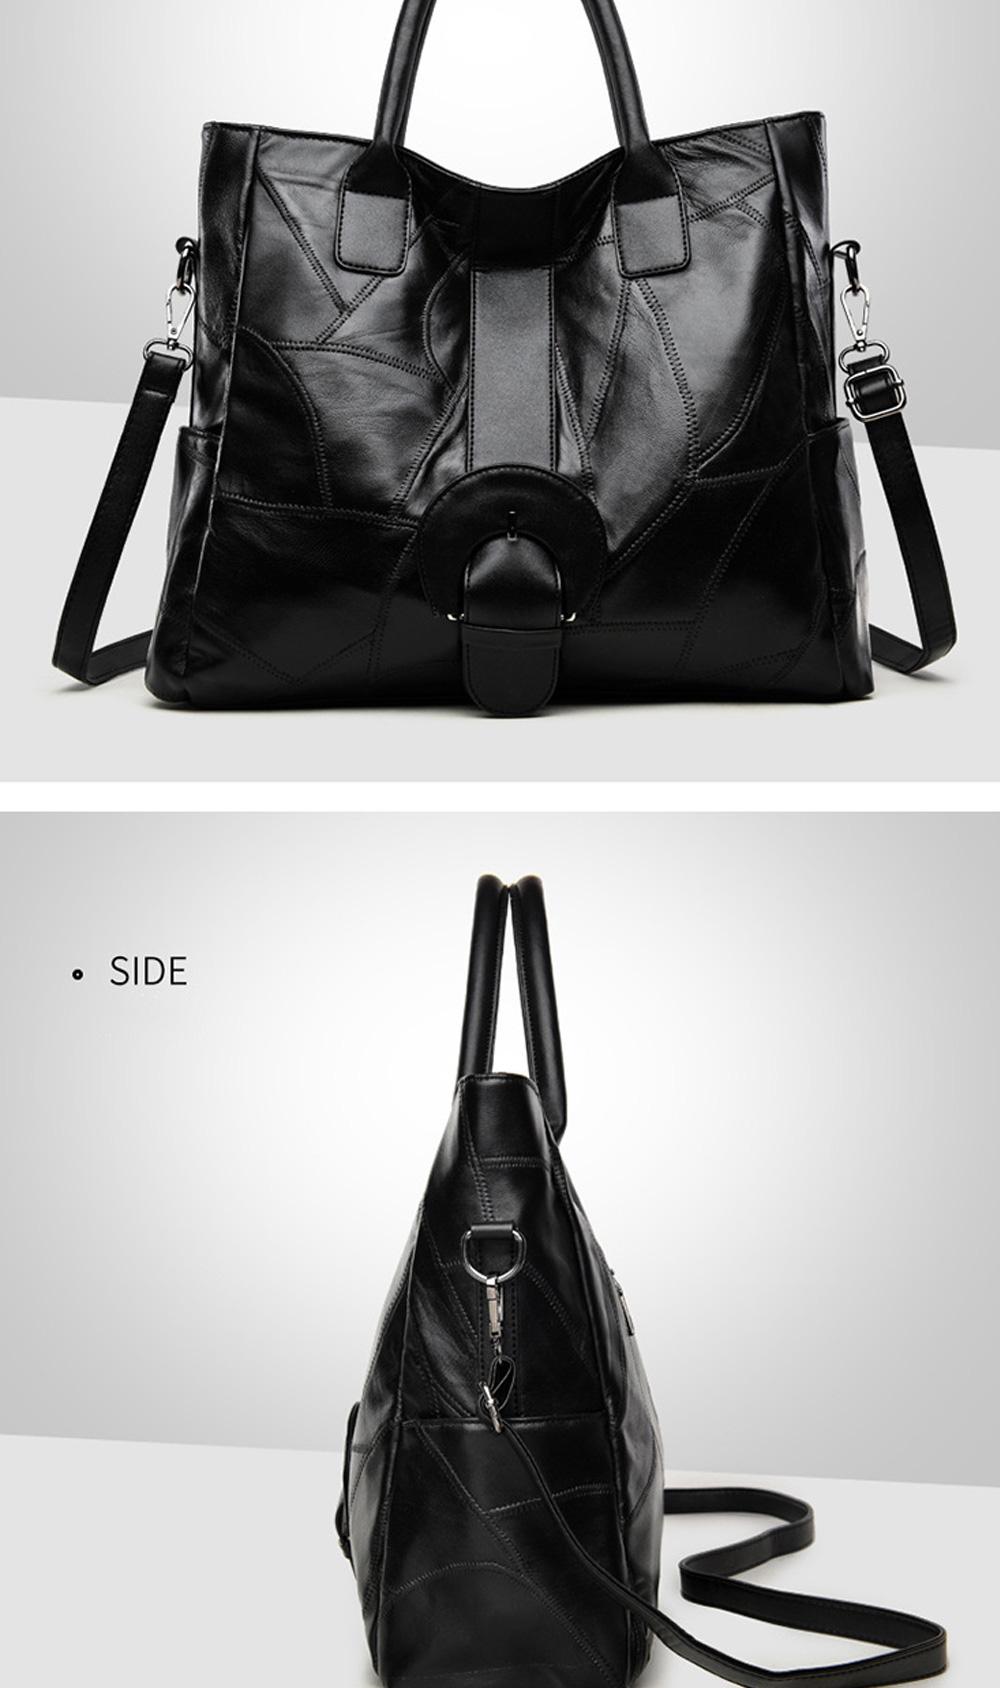 Genuine Leather Handbags Sheepskin Tote Bags, New Large-capacity Shoulder Handbags, Mommy bags Designed for women 33*10*31cm 5